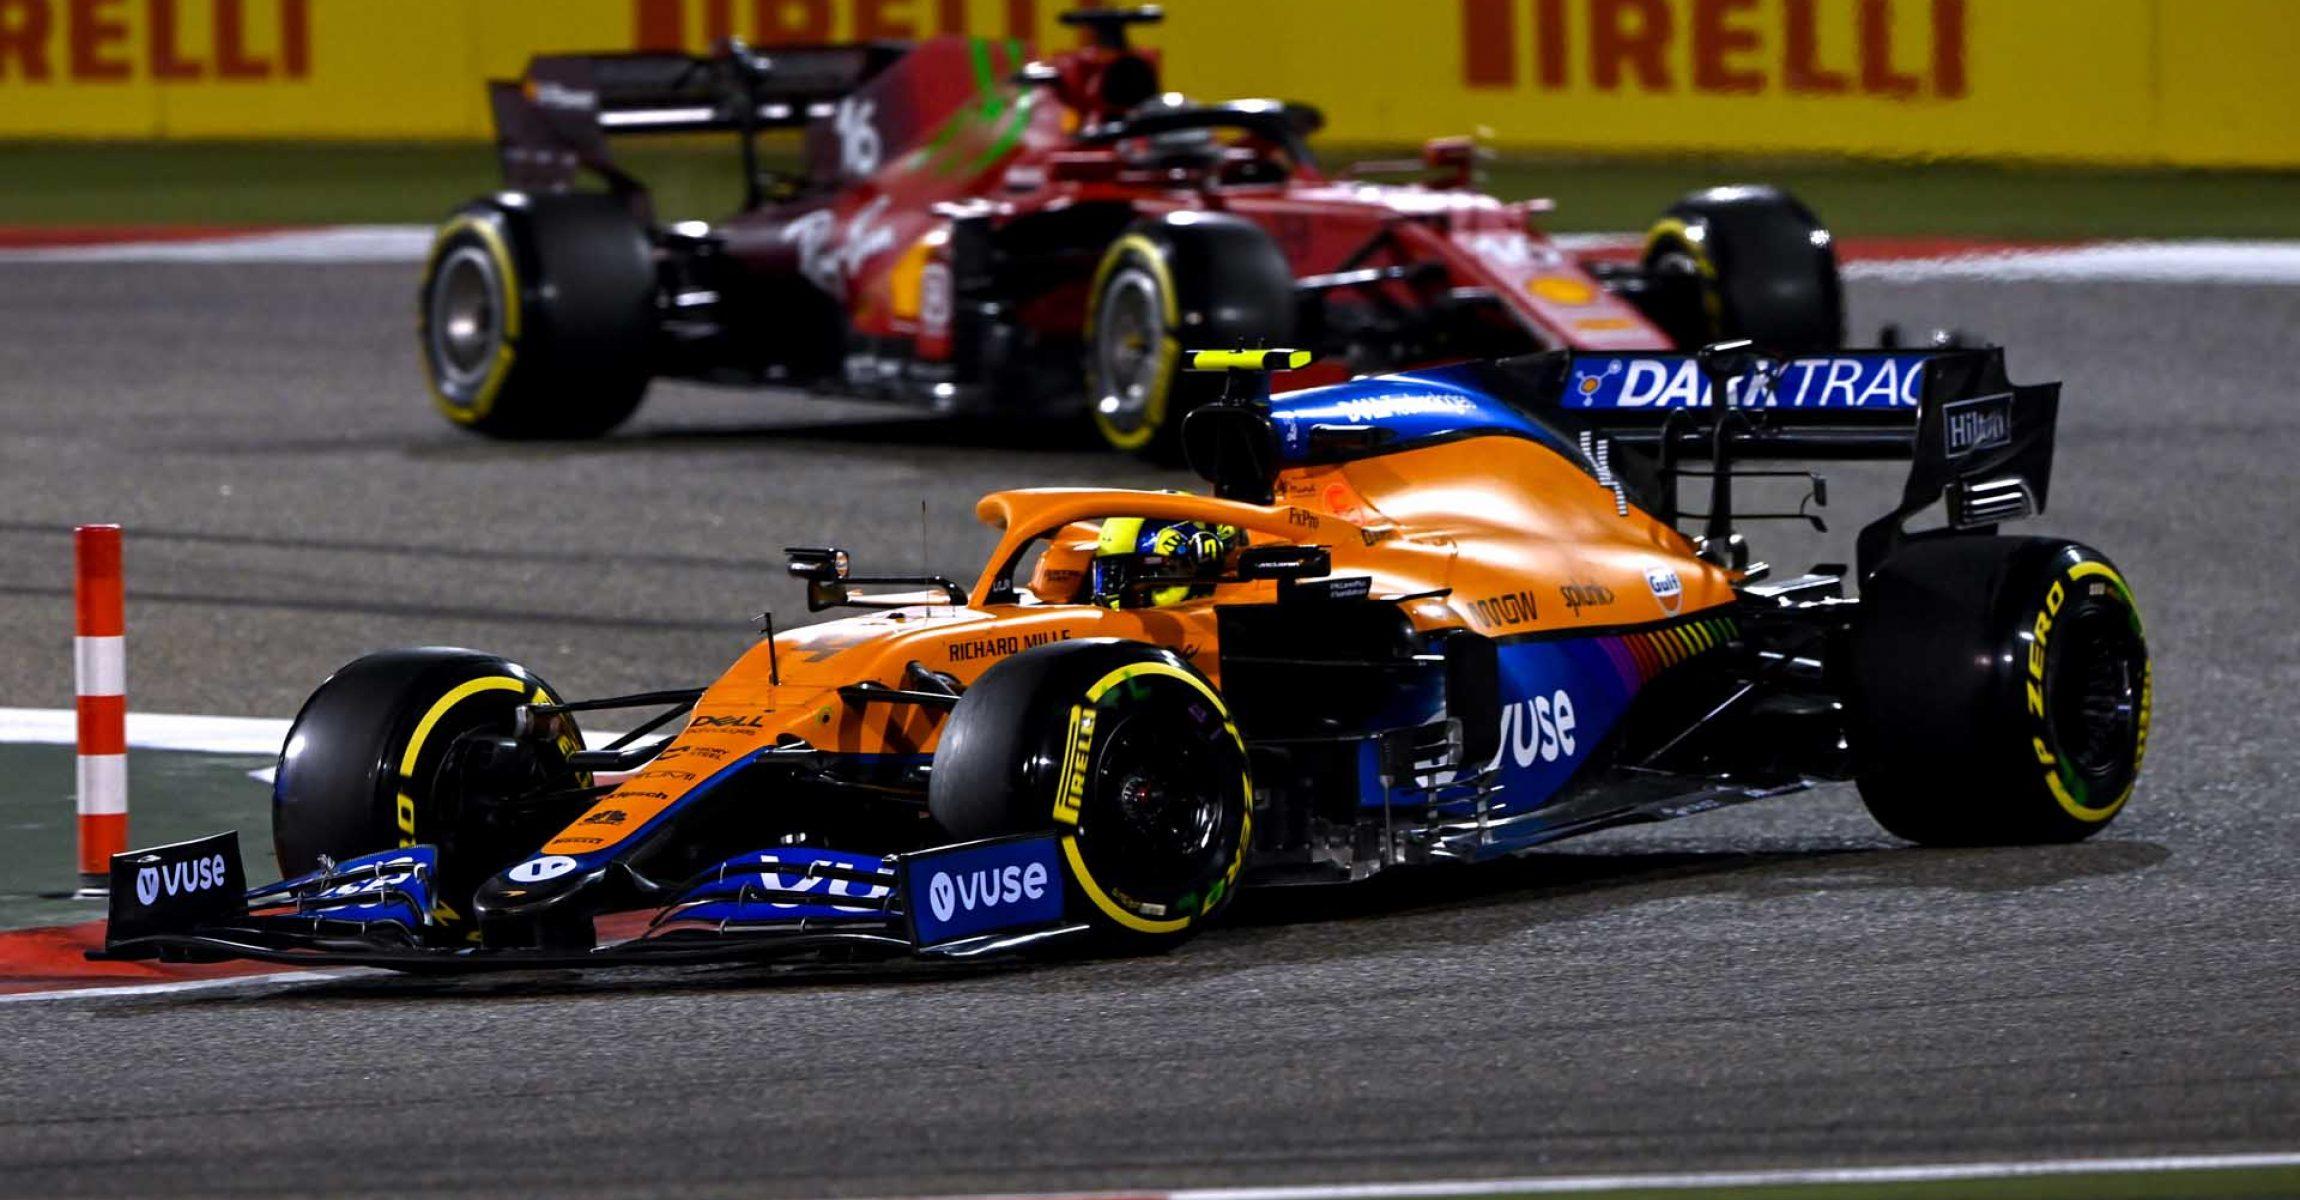 Lando Norris, McLaren MCL35M, leads Charles Leclerc, Ferrari SF21 entering corner